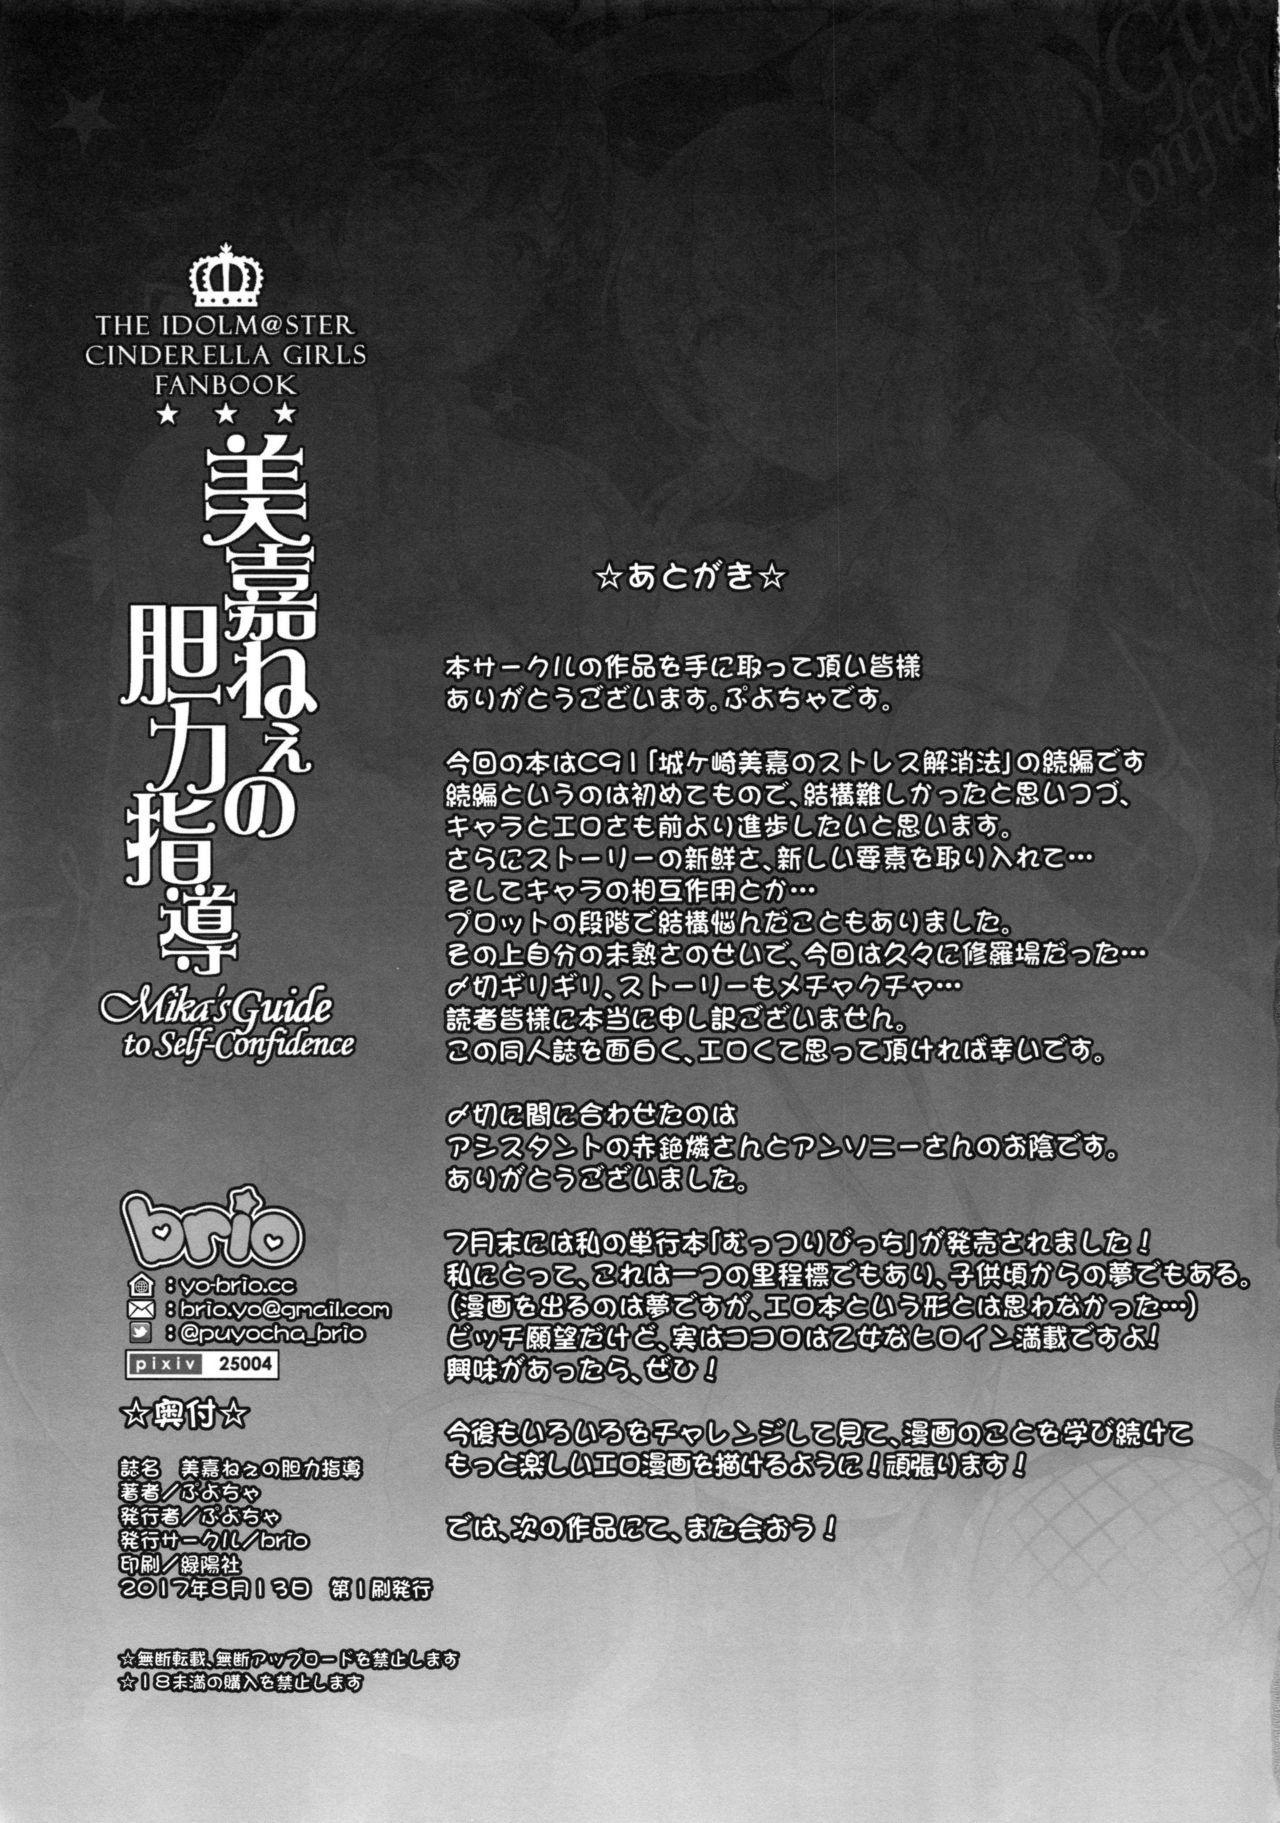 (C92) [BRIO (Puyocha)] Mika-nee no Tanryoku Shidou - Mika's Guide to Self-Confidence (THE IDOLM@STER CINDERELLA GIRLS) [English] {doujins.com} 23